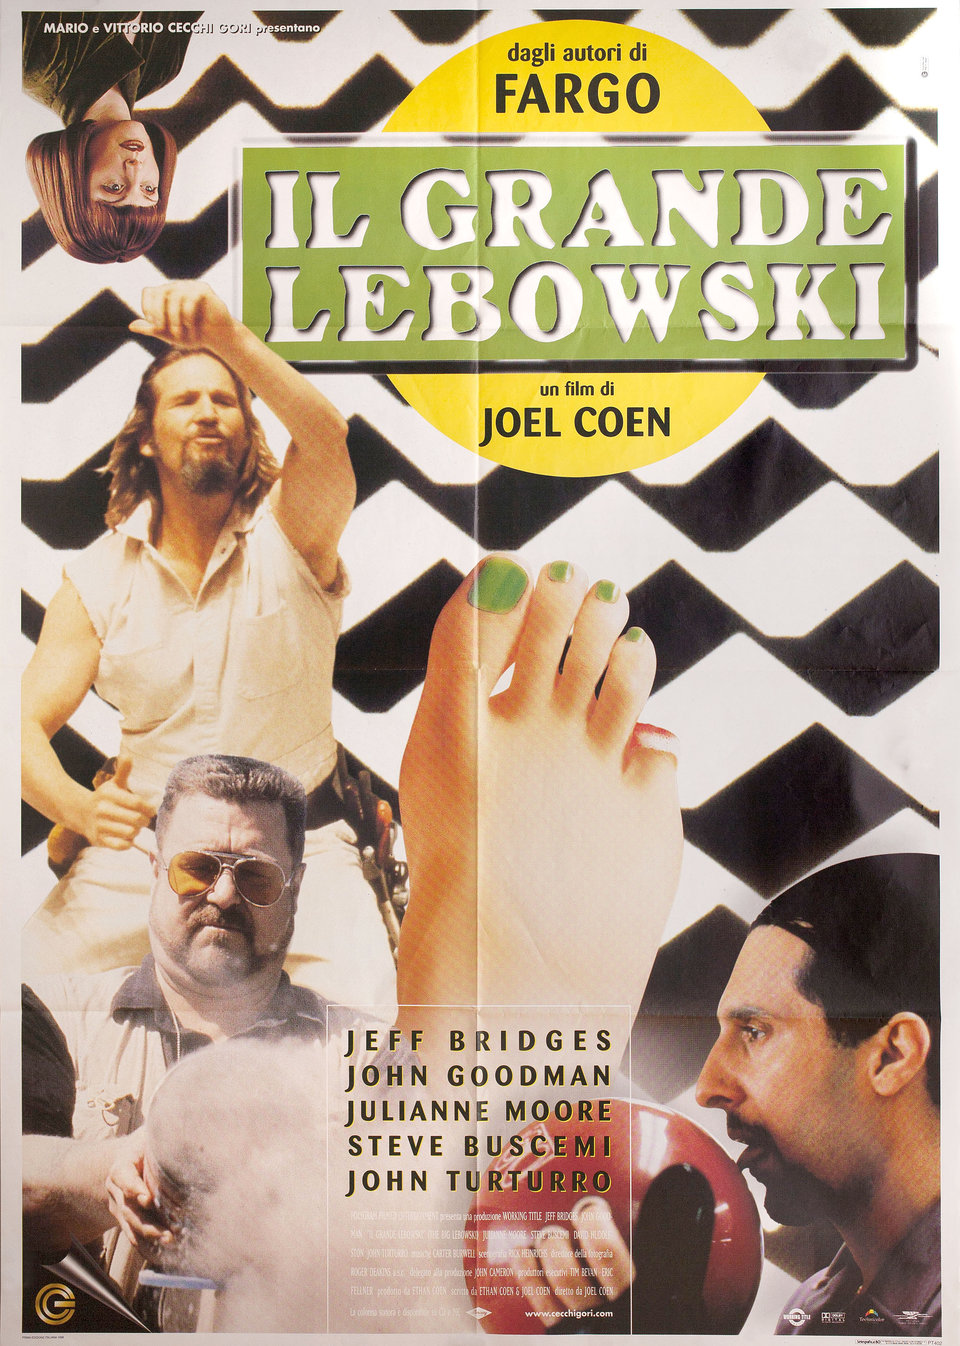 The Big Lebowski 1998 Italian Due Fogli Poster